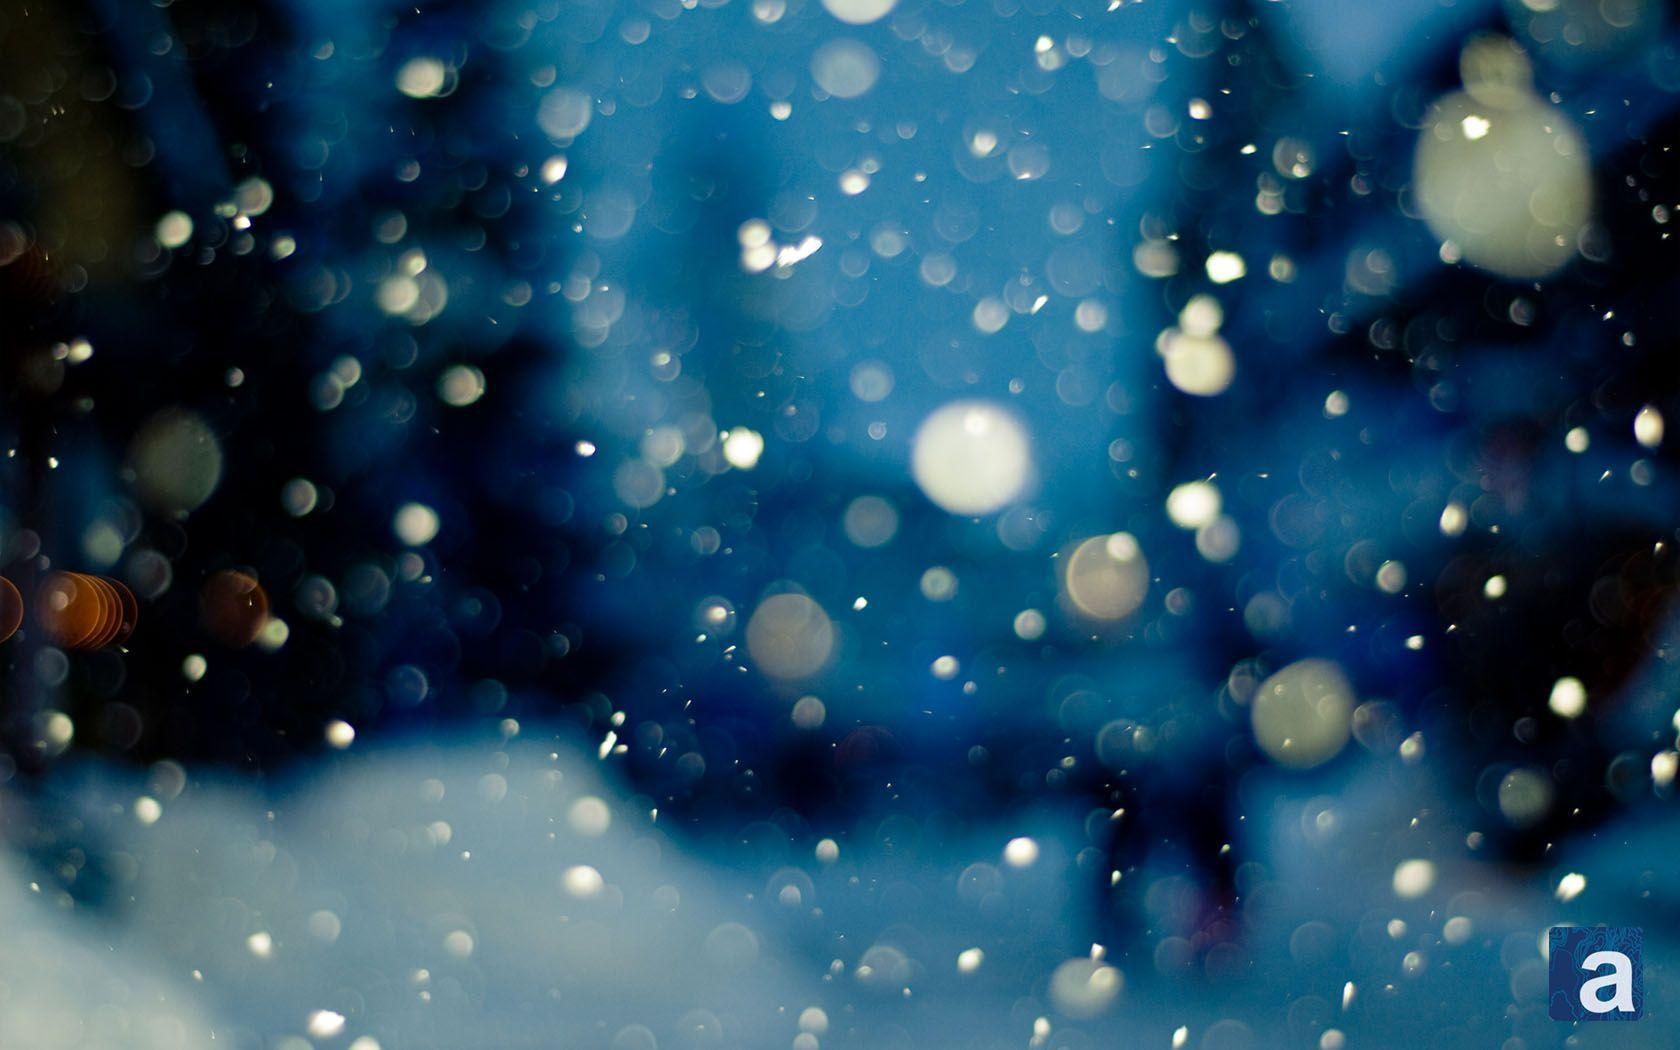 Desktop Wallpaper Falling Snow Snowfall Wallpapers Wallpaper Cave